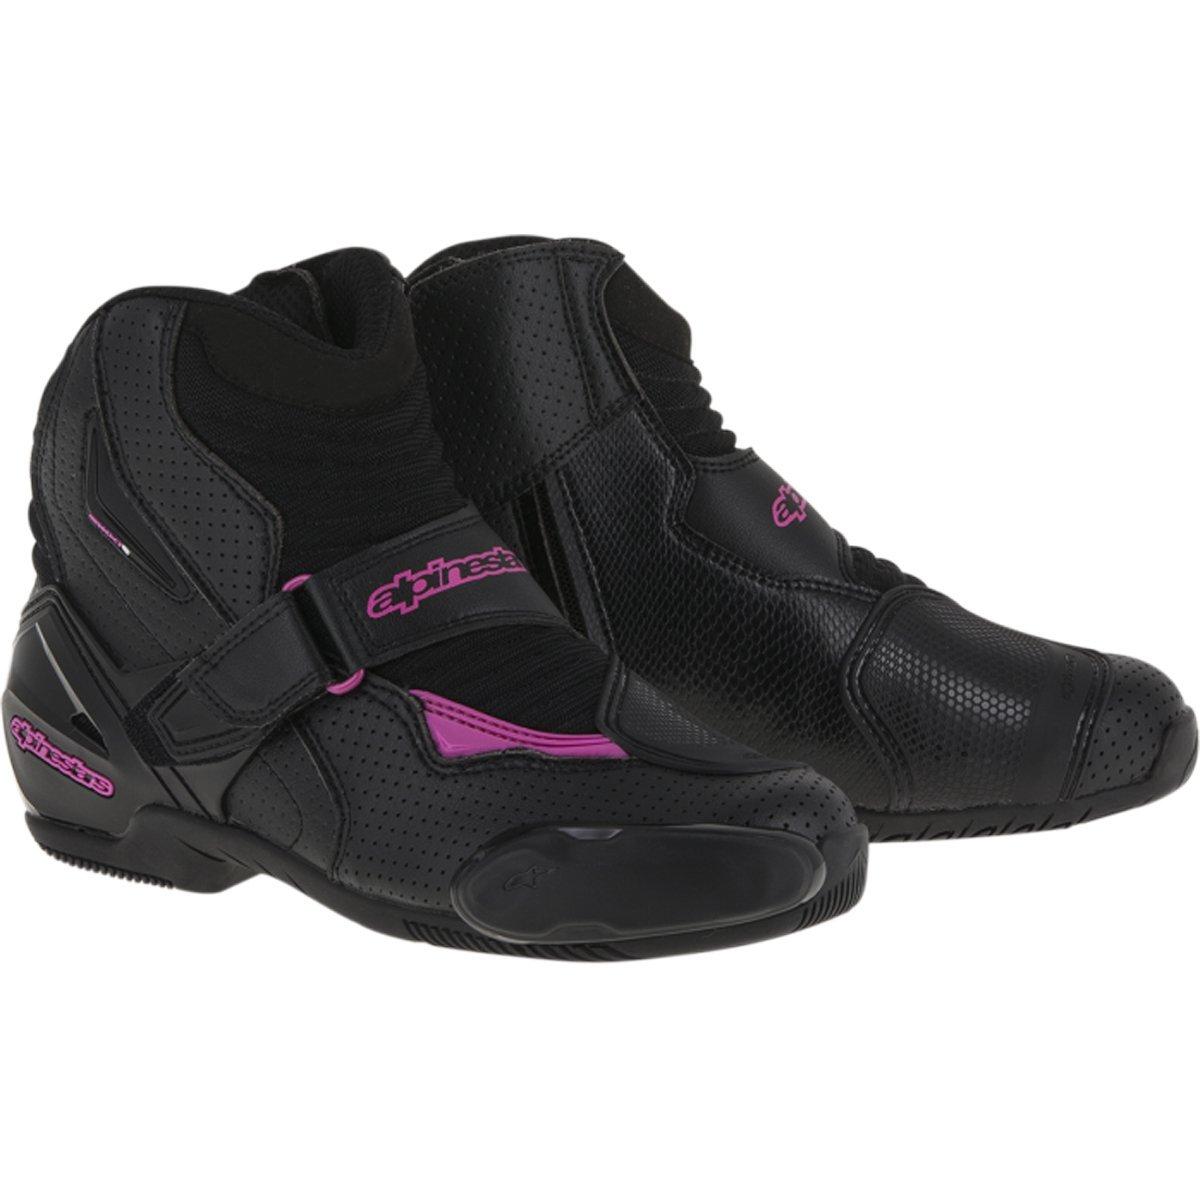 Alpinestars Stella S-MX 1R Vented Women's Street Motorcycle Shoes - Black/Pink / 38